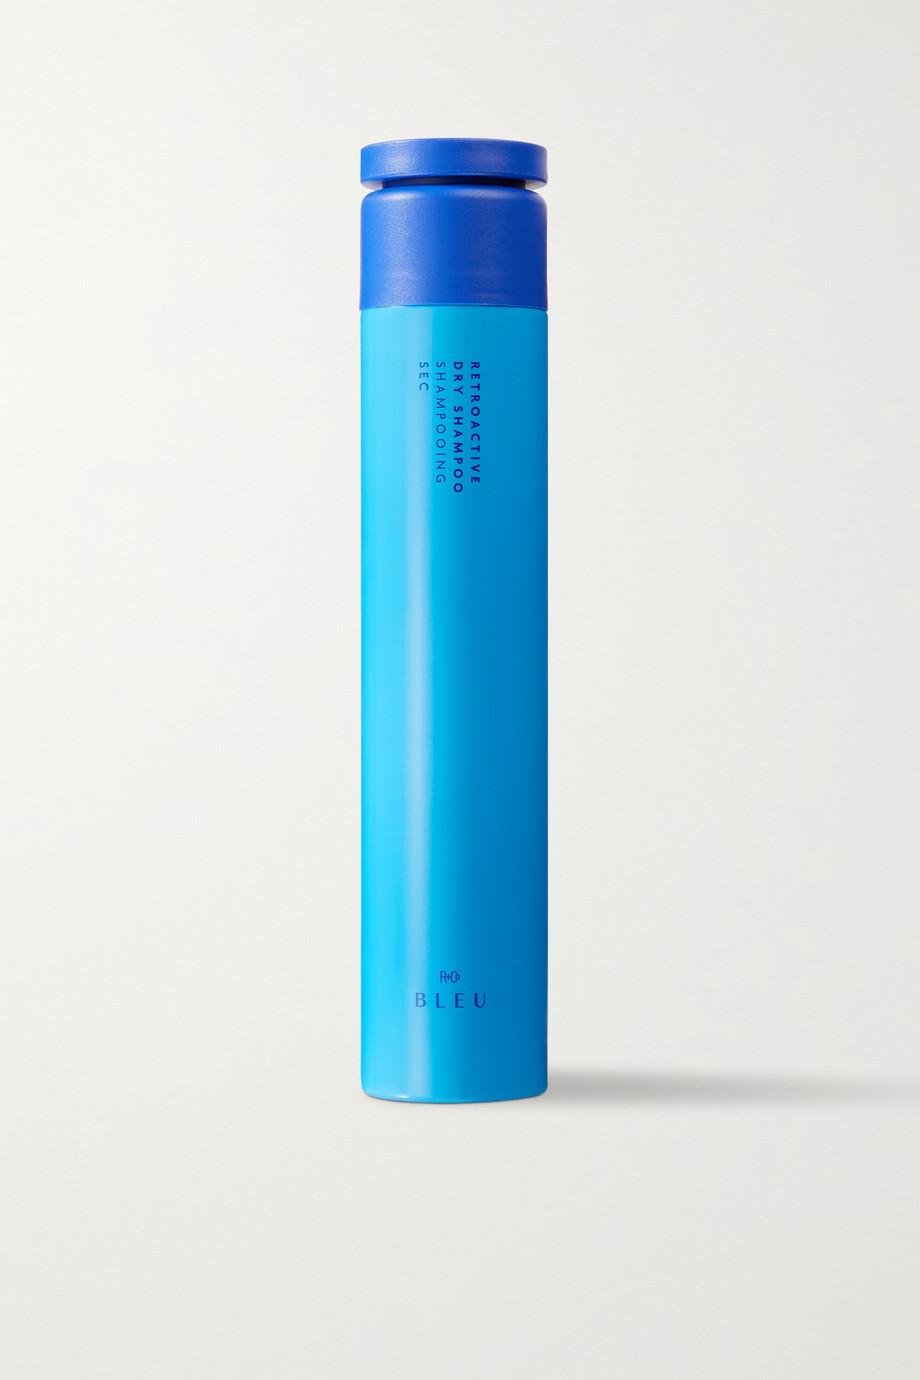 R+Co BLEU Retroactive Dry Shampoo, 192ml